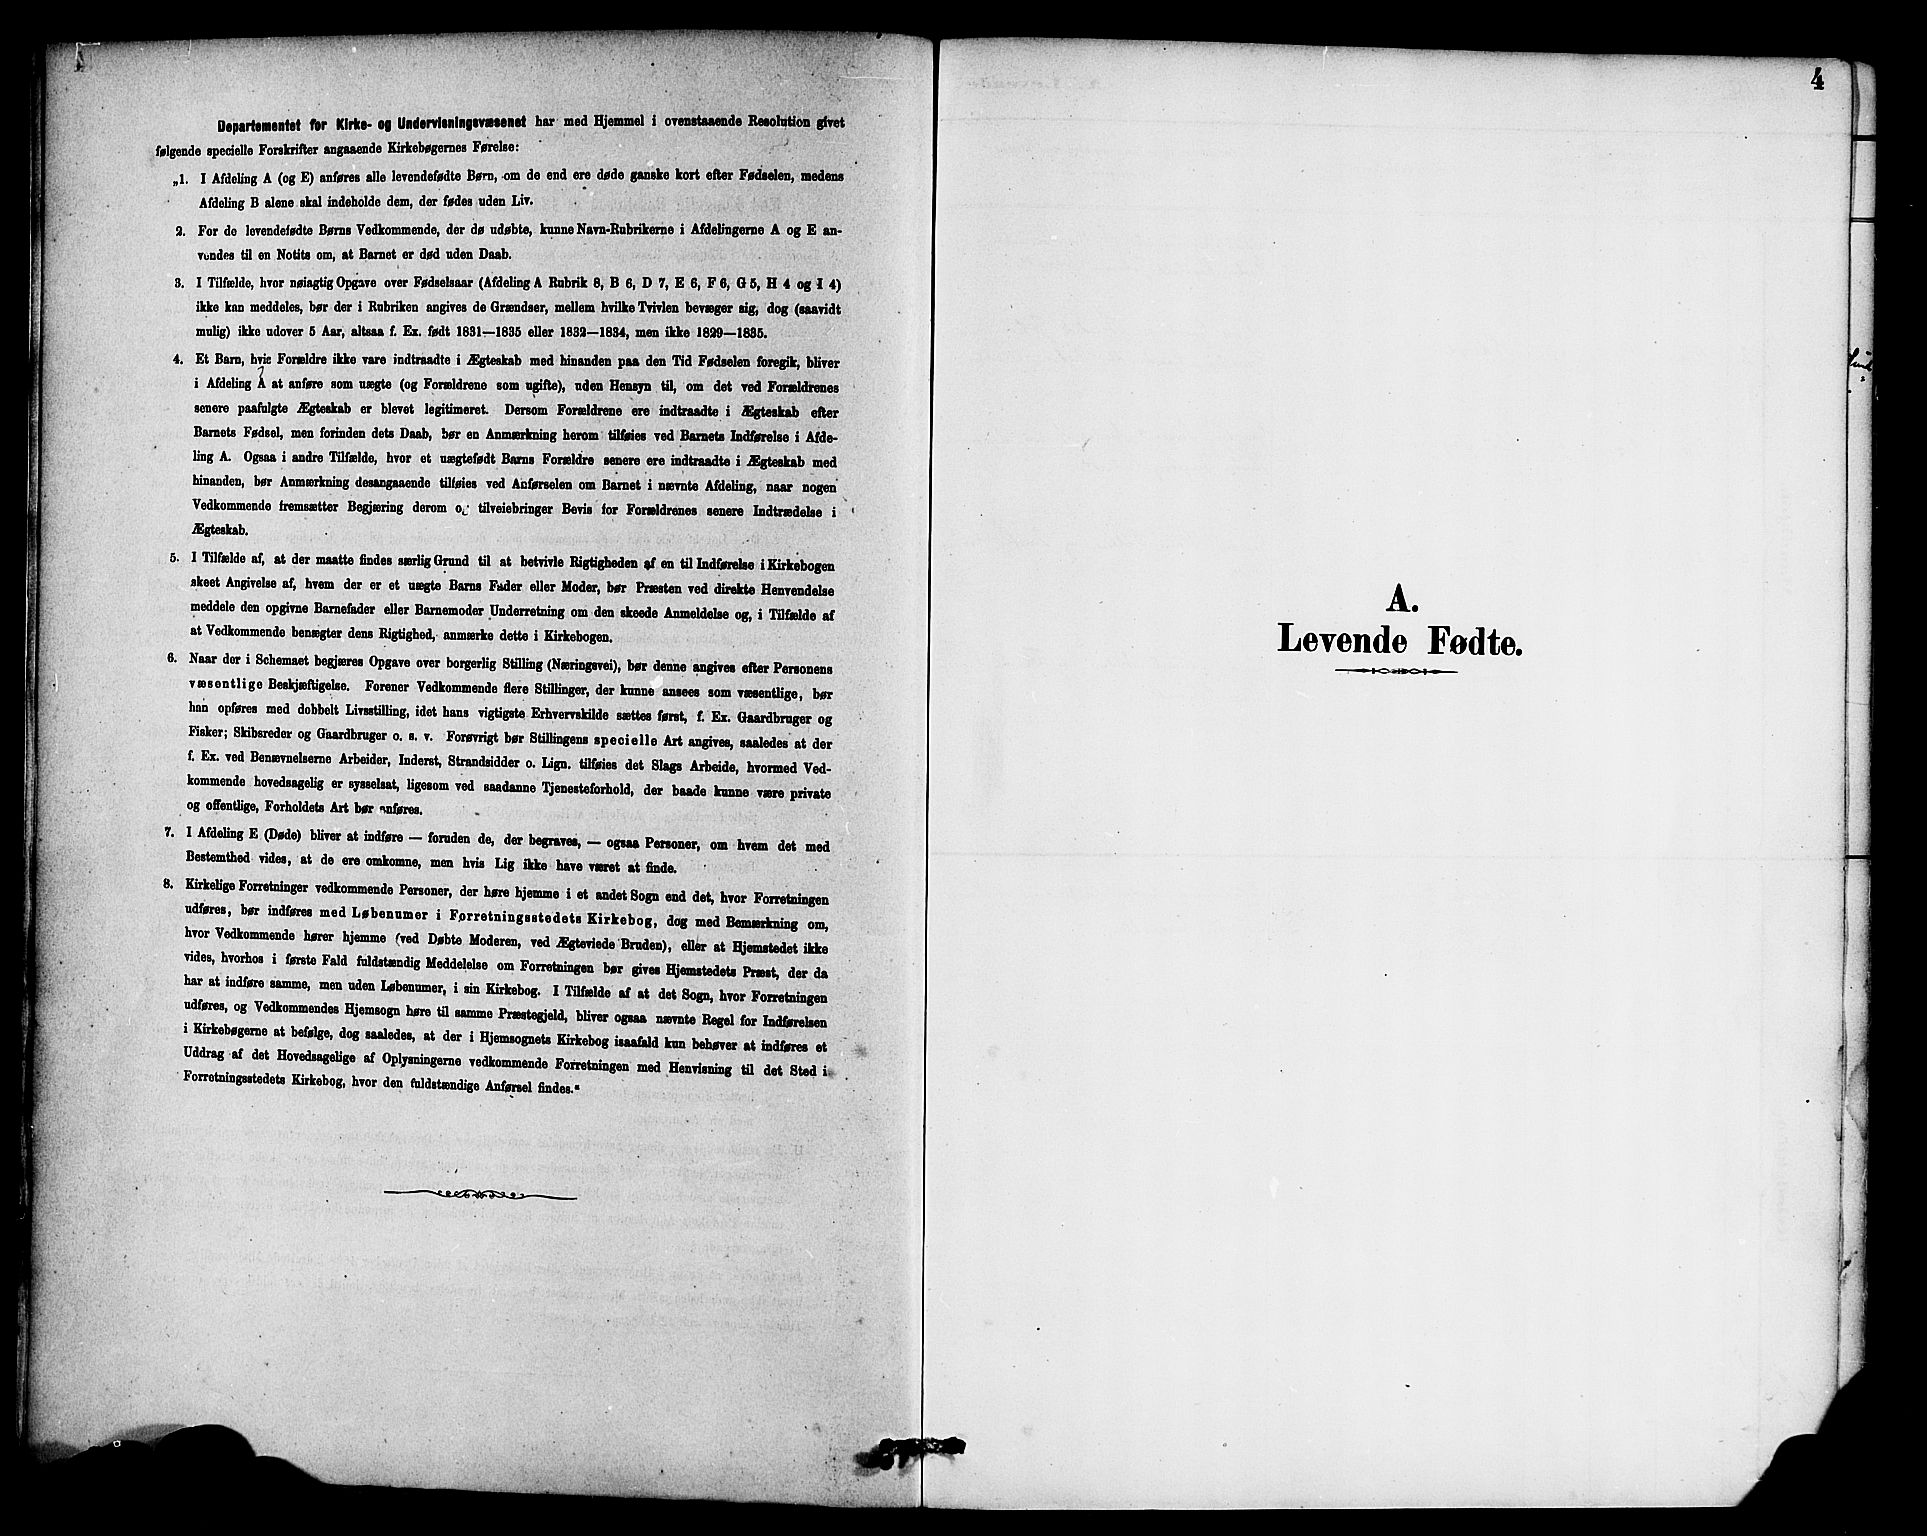 SAB, Hyllestad sokneprestembete, Ministerialbok nr. B 1, 1886-1904, s. 4